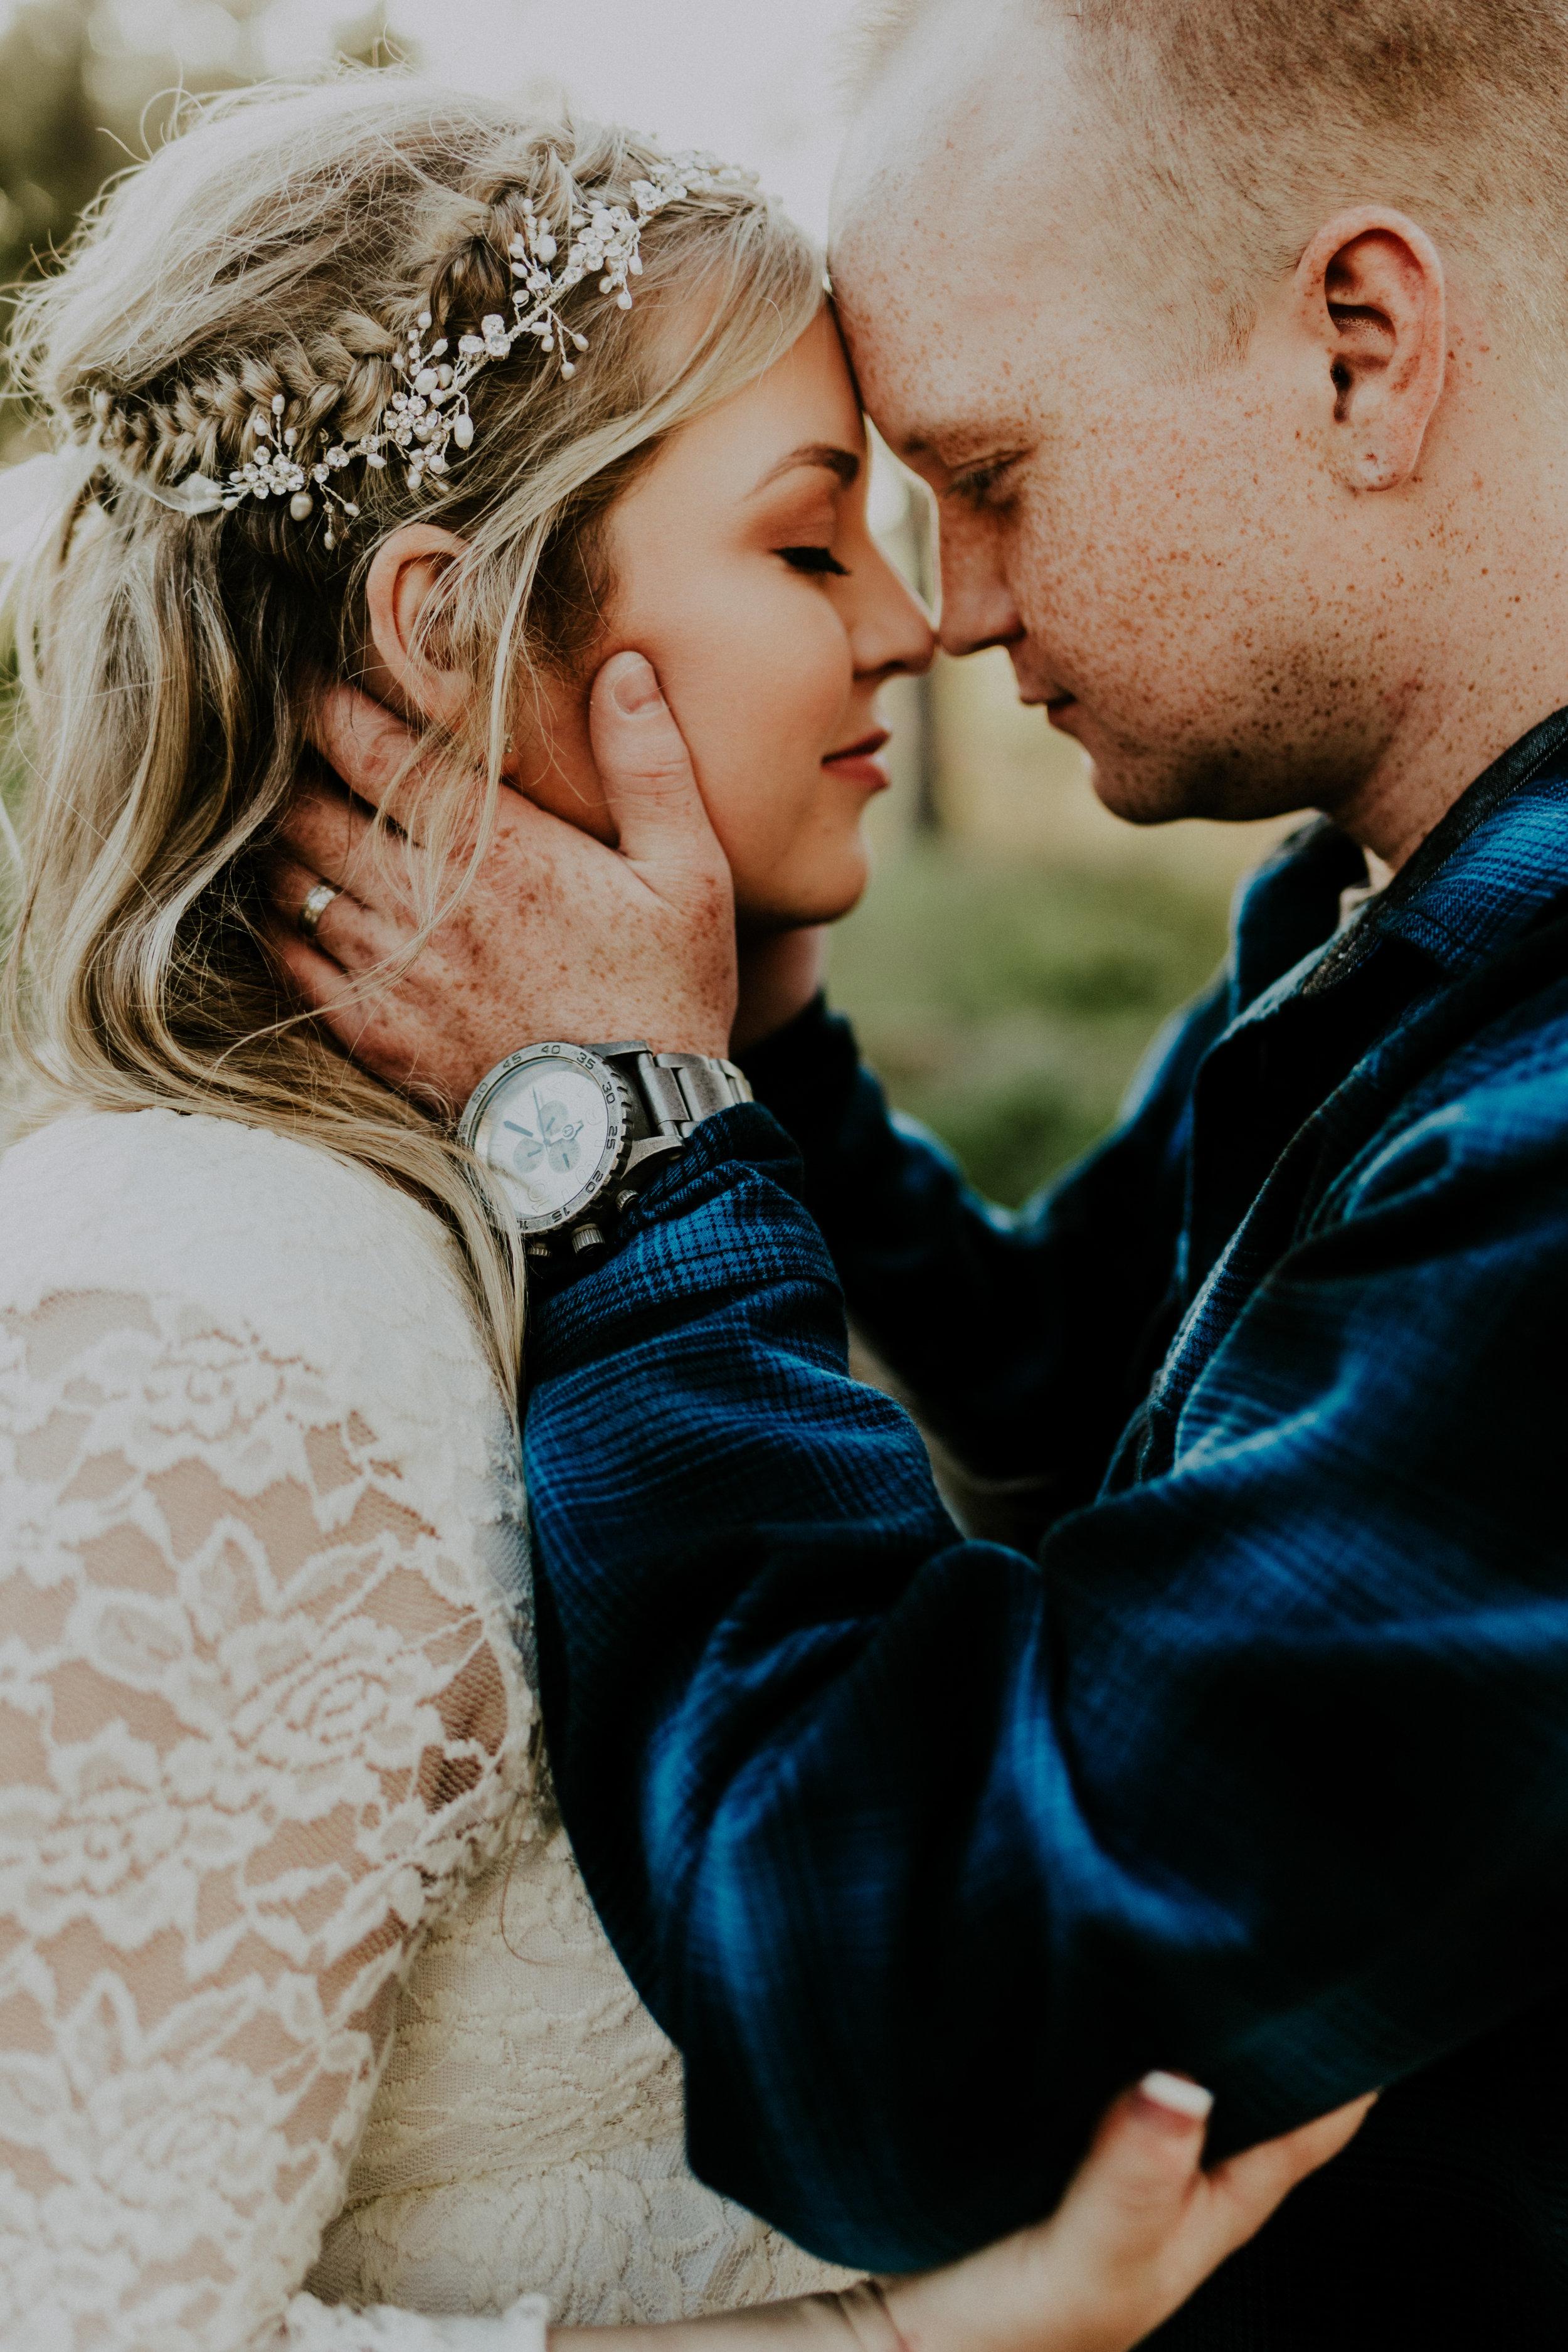 Man kissing his fiance's forehead